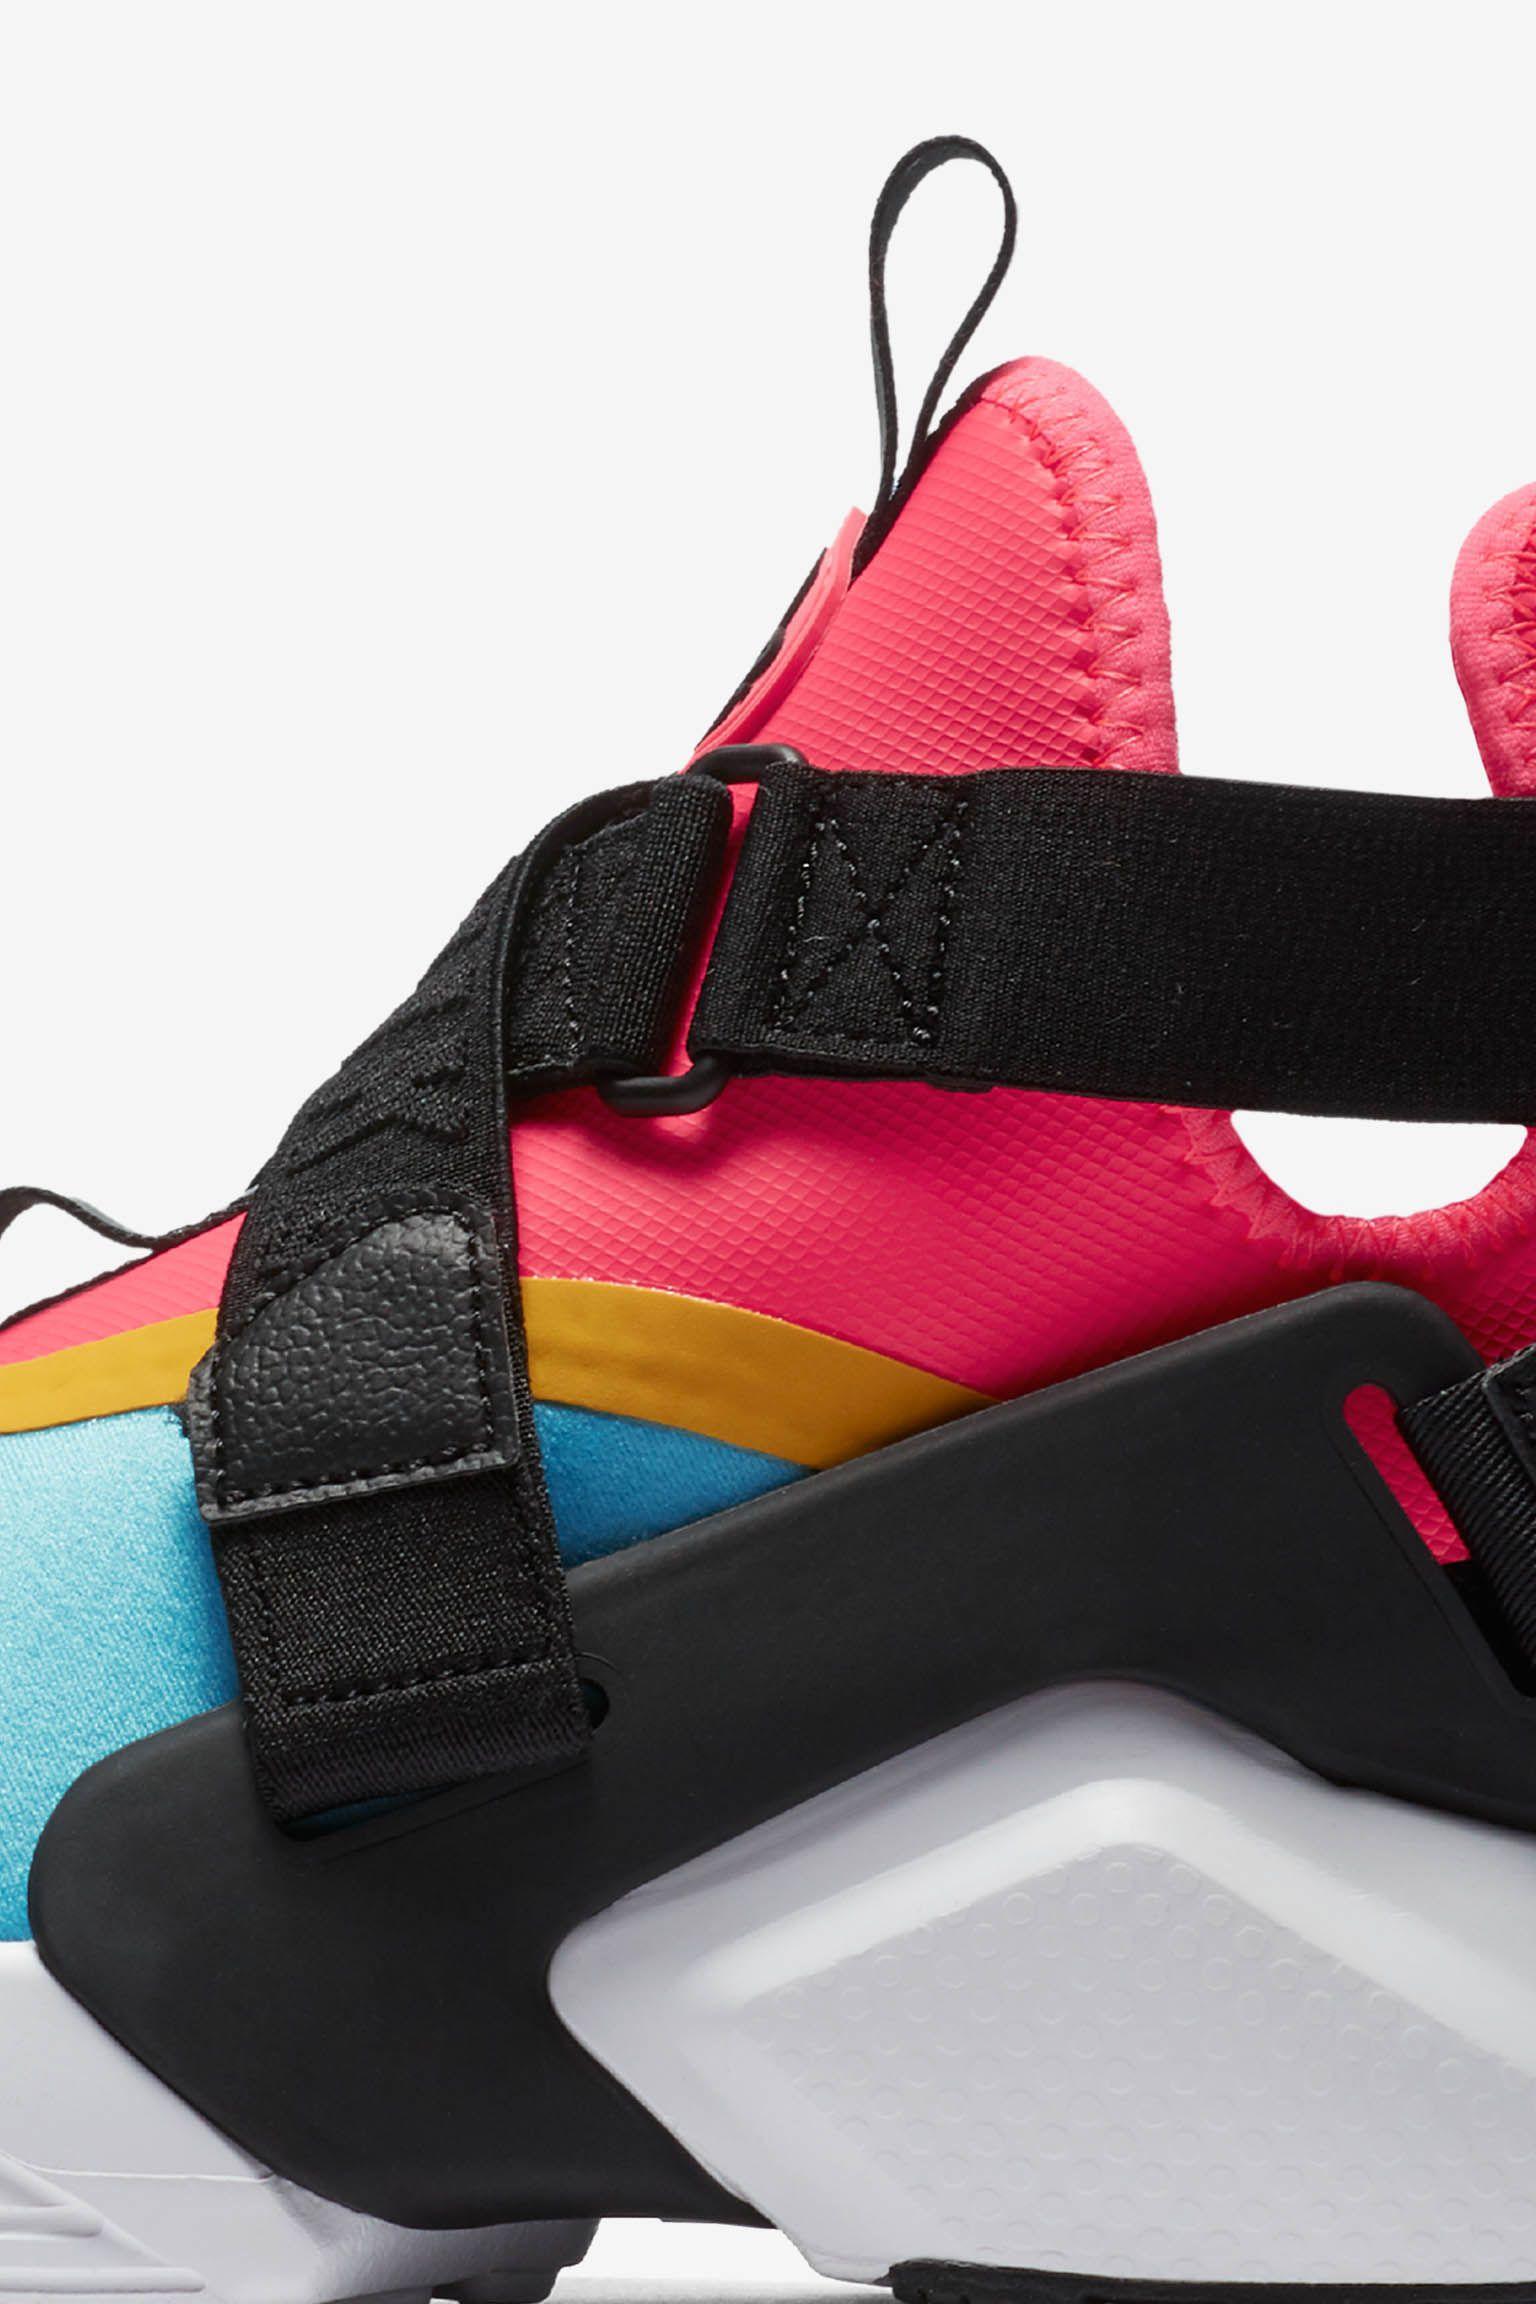 Nike Women S Air Huarache City Bleached Aqua Racer Pink Release Date Nike Snkrs